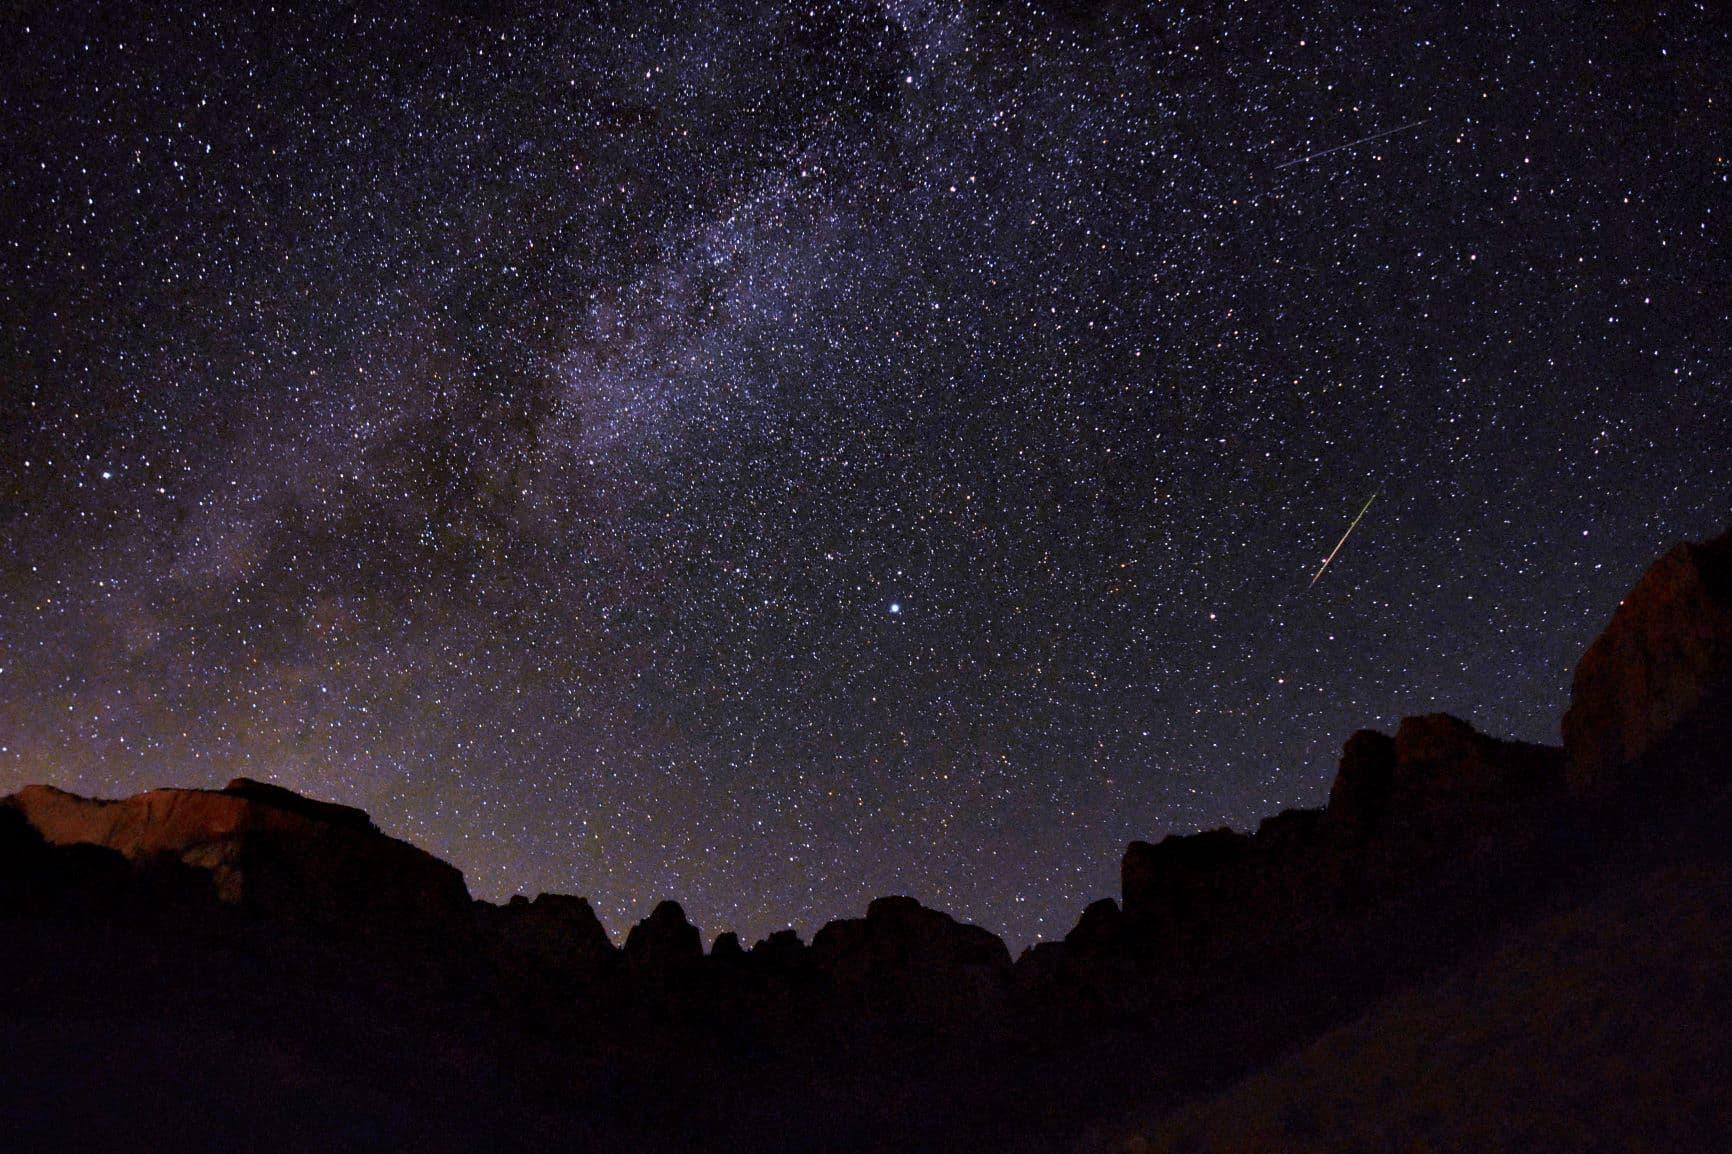 Zion national park, dark sky, Utah